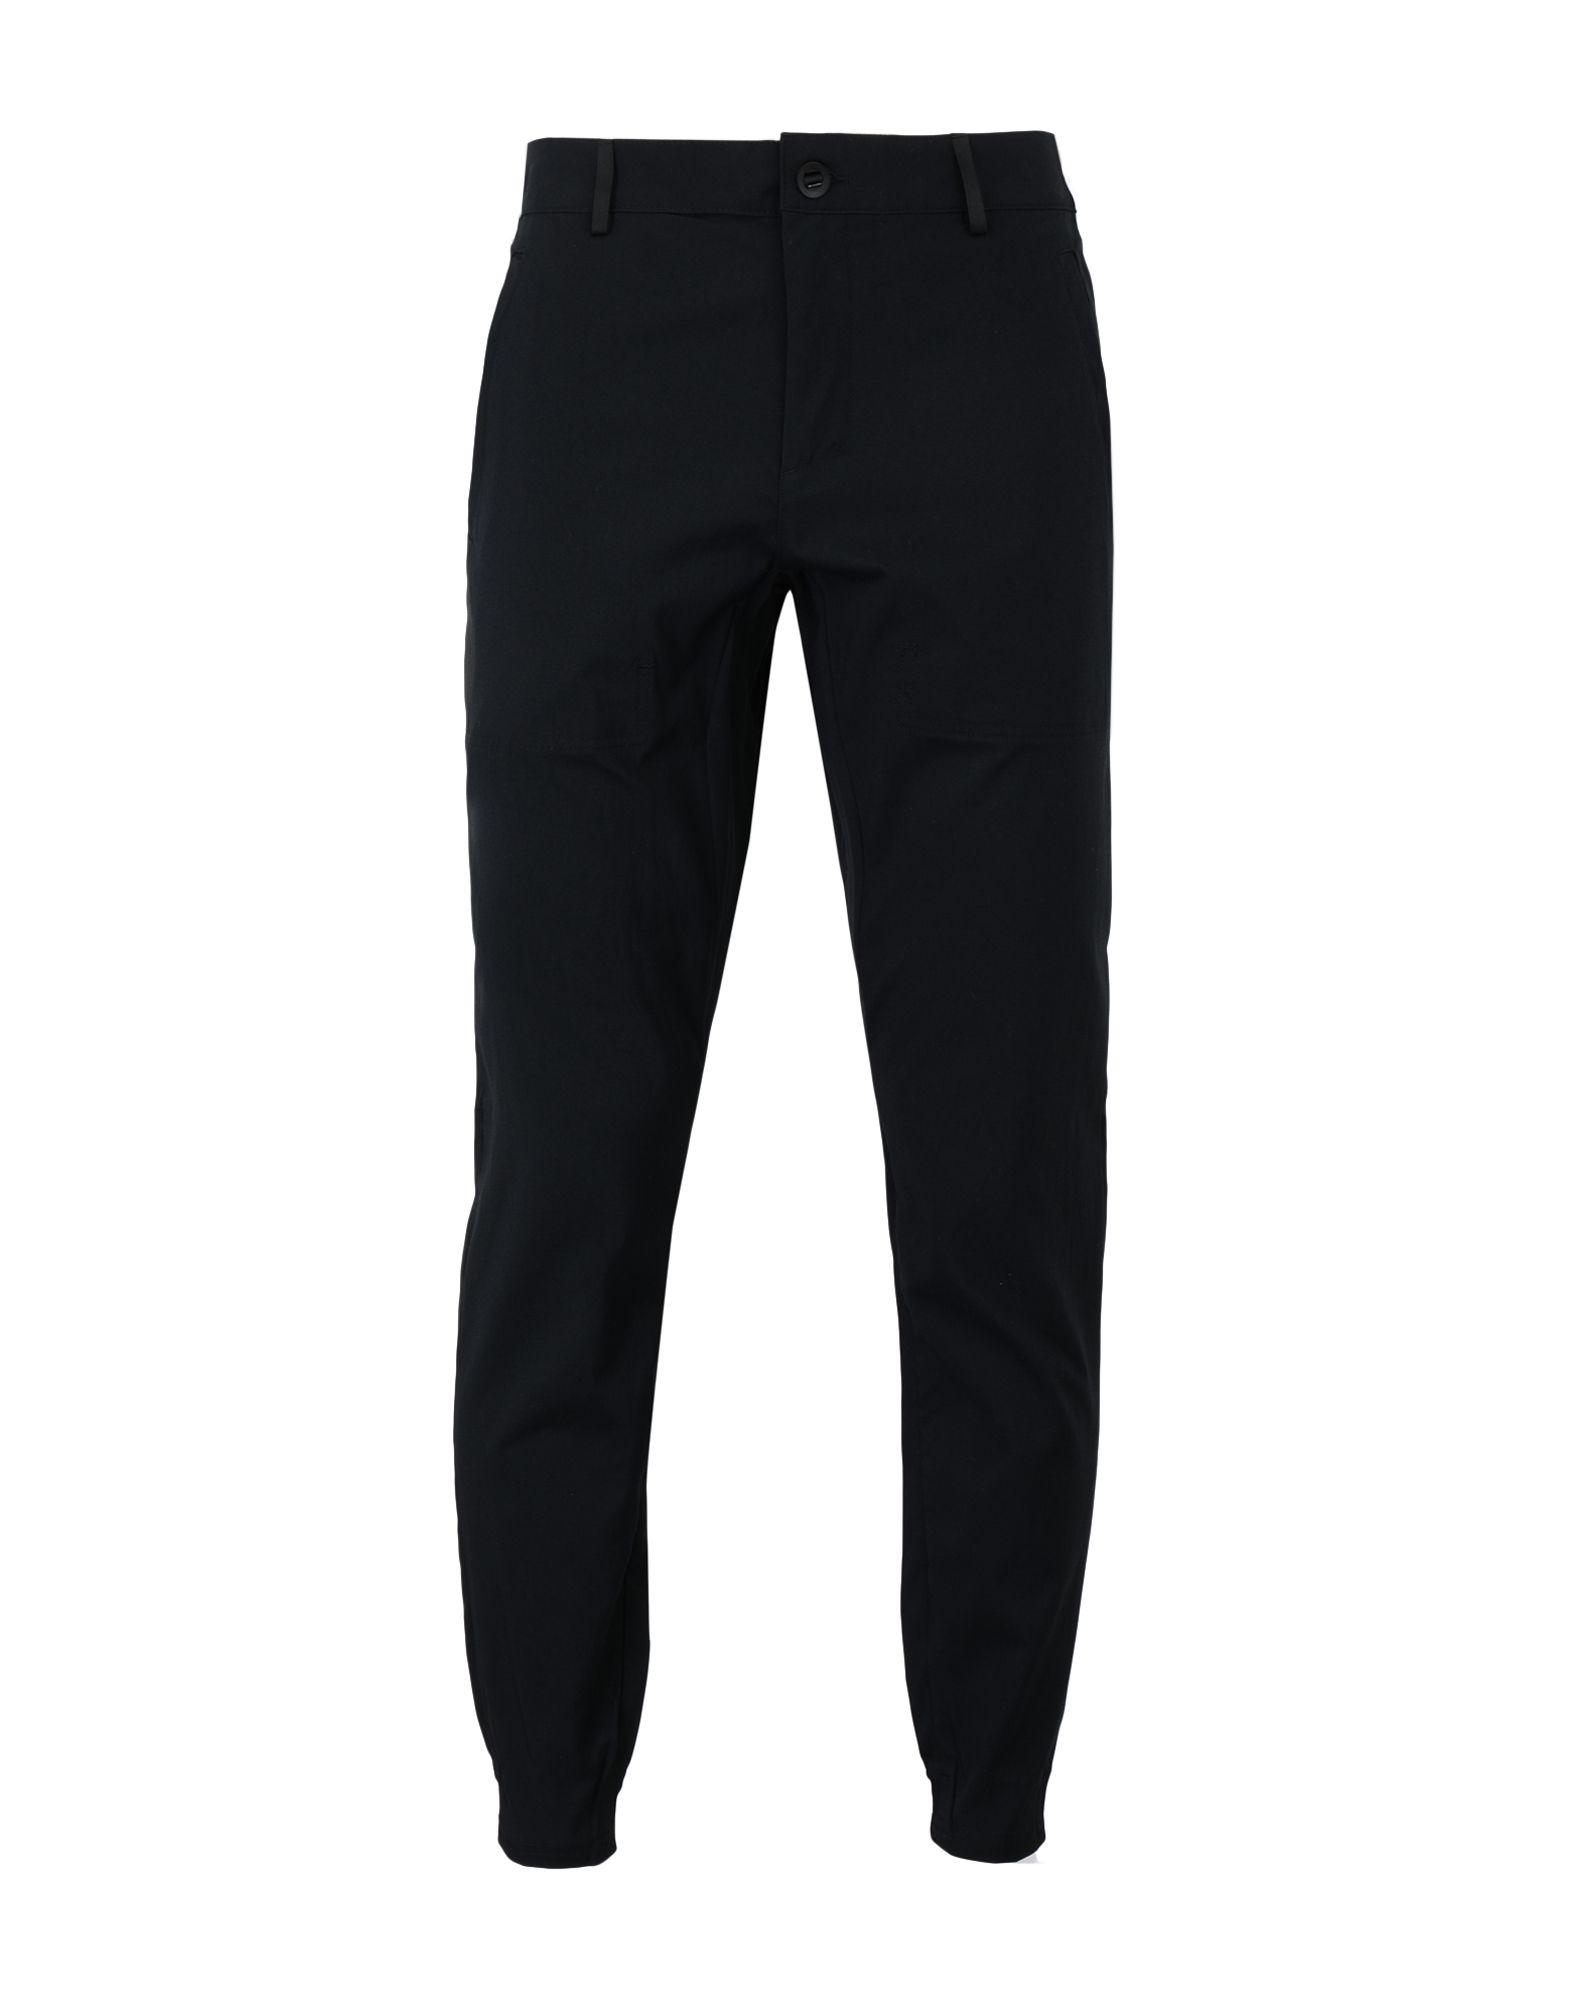 Pantalone Columbia West End Pant - herren - 13315945ME